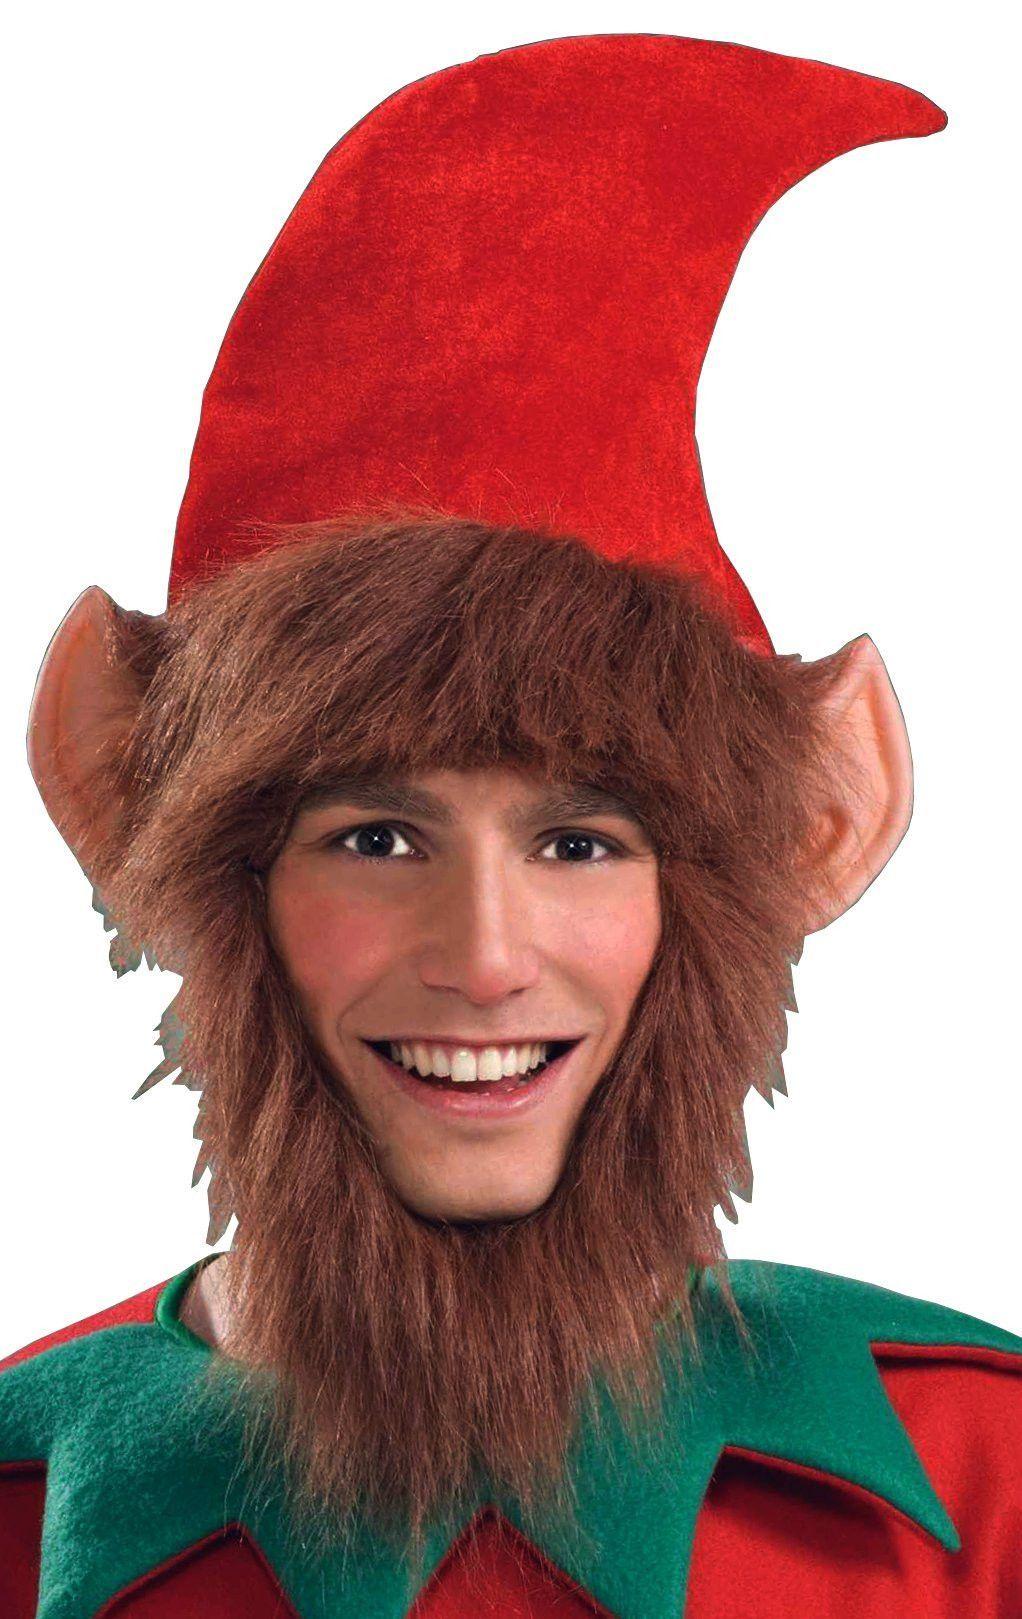 69ddffaaa2198 Christmas Elf Ears   Beard Costume Hat